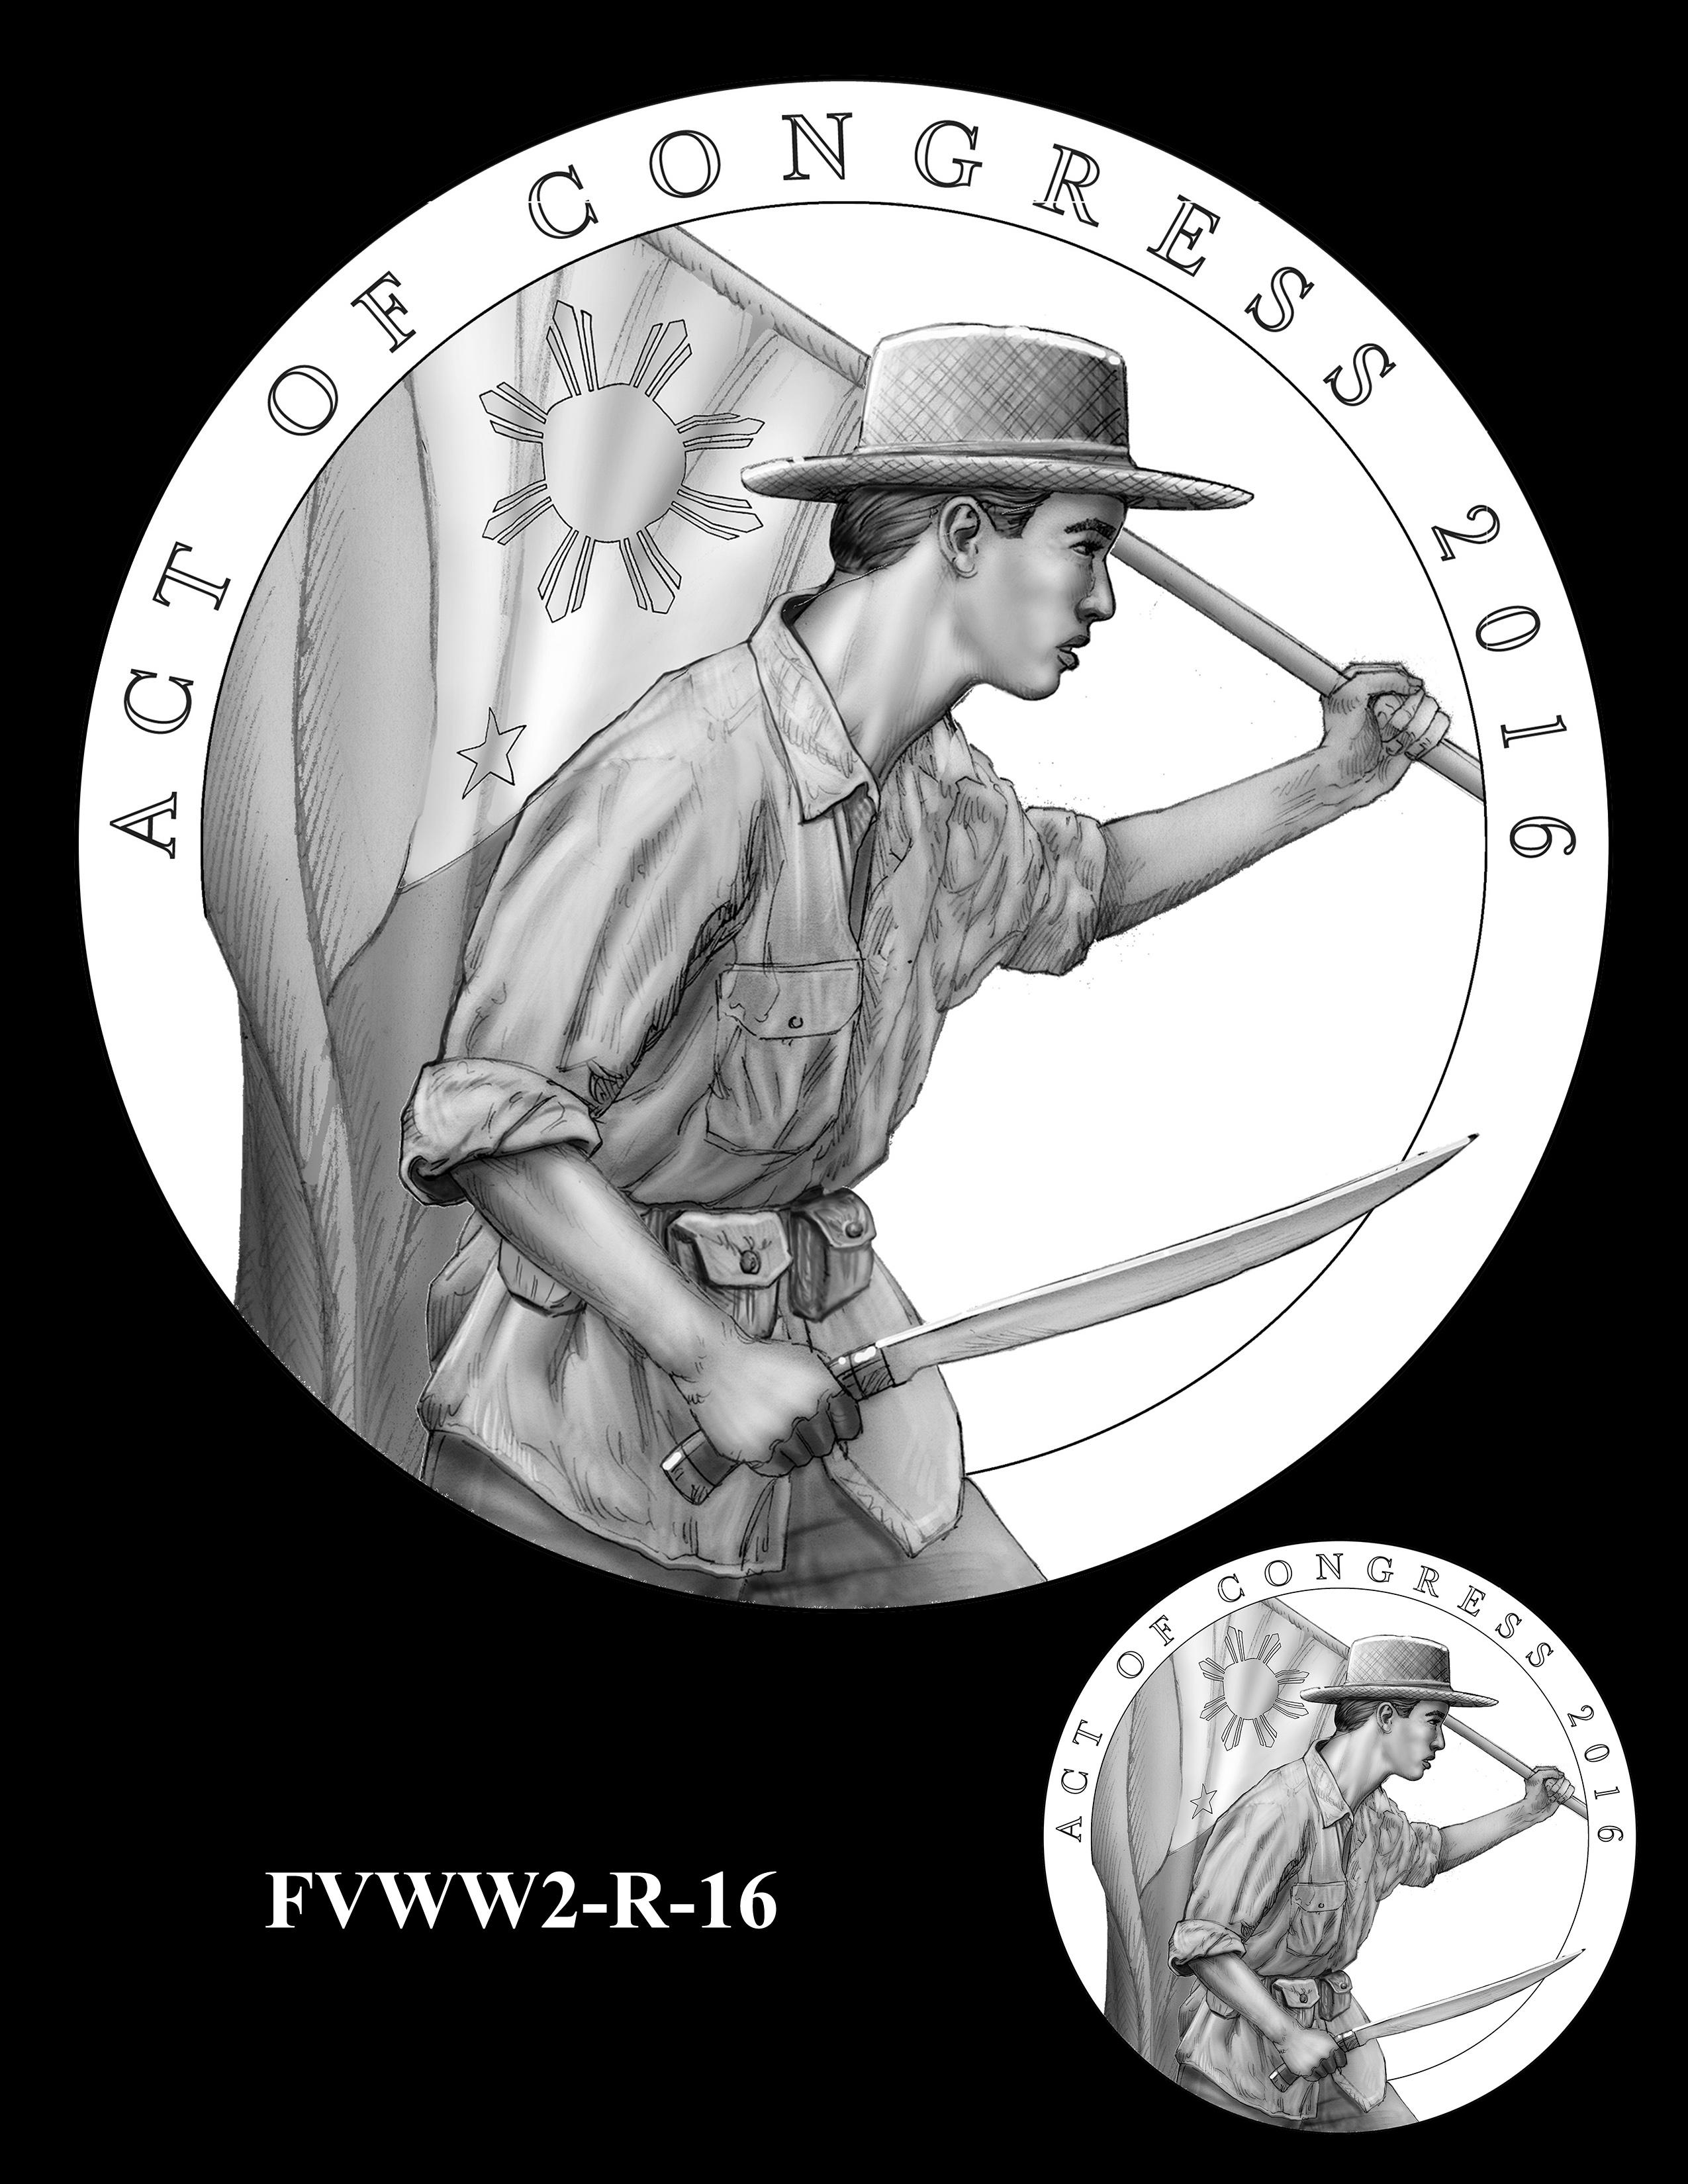 FVWW2-R-16 -- Filipino Veterans of World War II Congressional Gold Medal